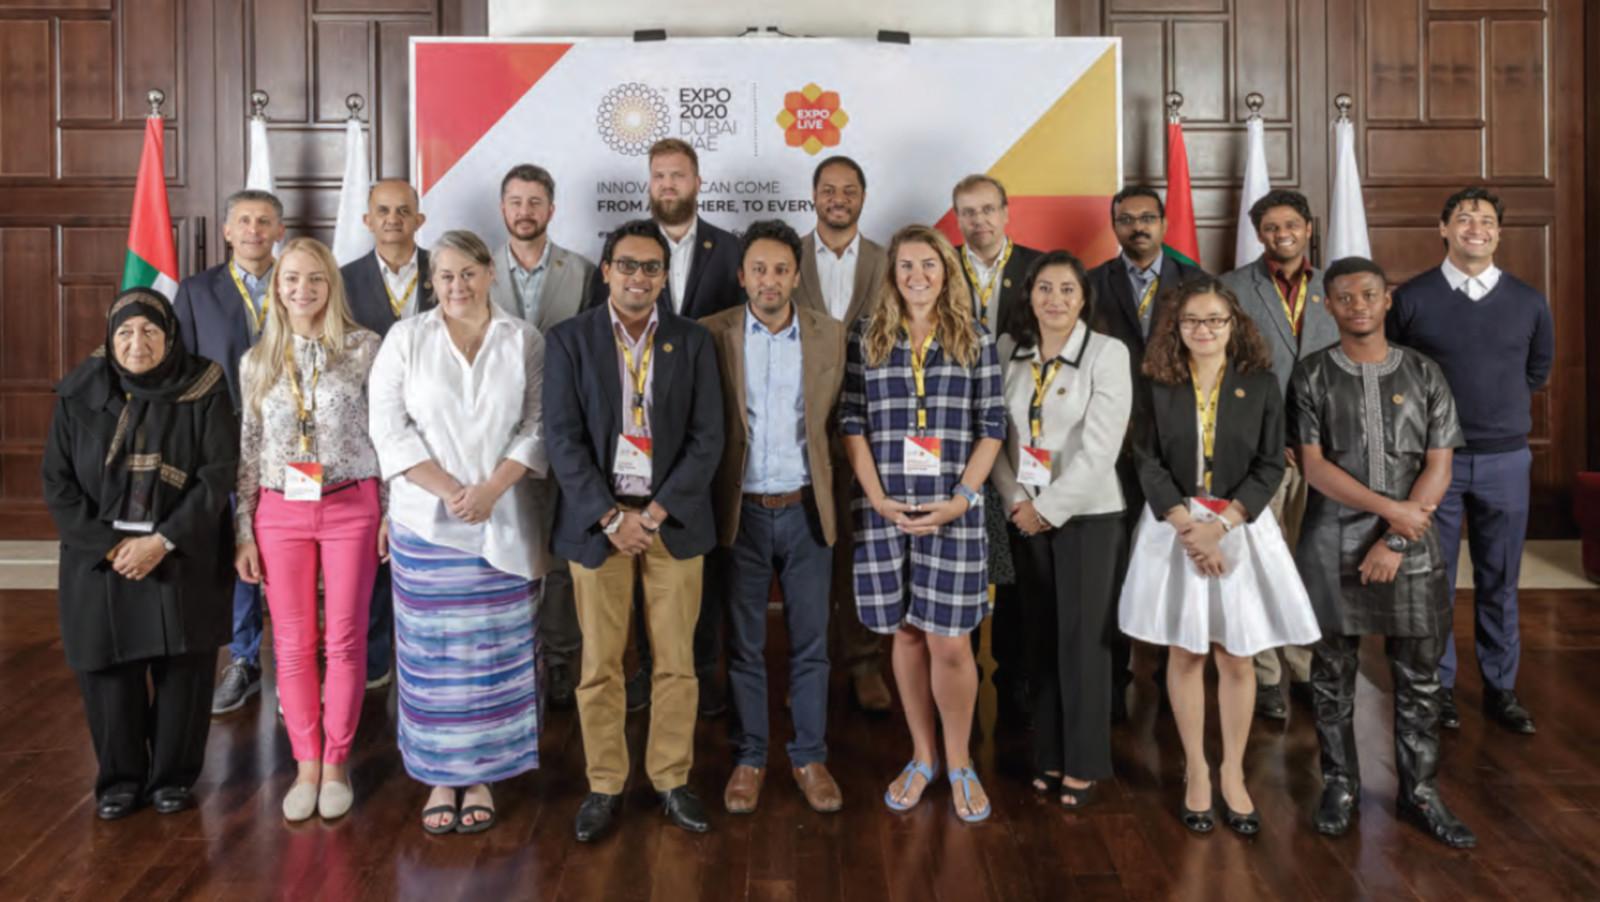 Social entrepreneurs can tap up to $100k with Expo 2020 Dubai Innovation Impact Grant - Ventureburn